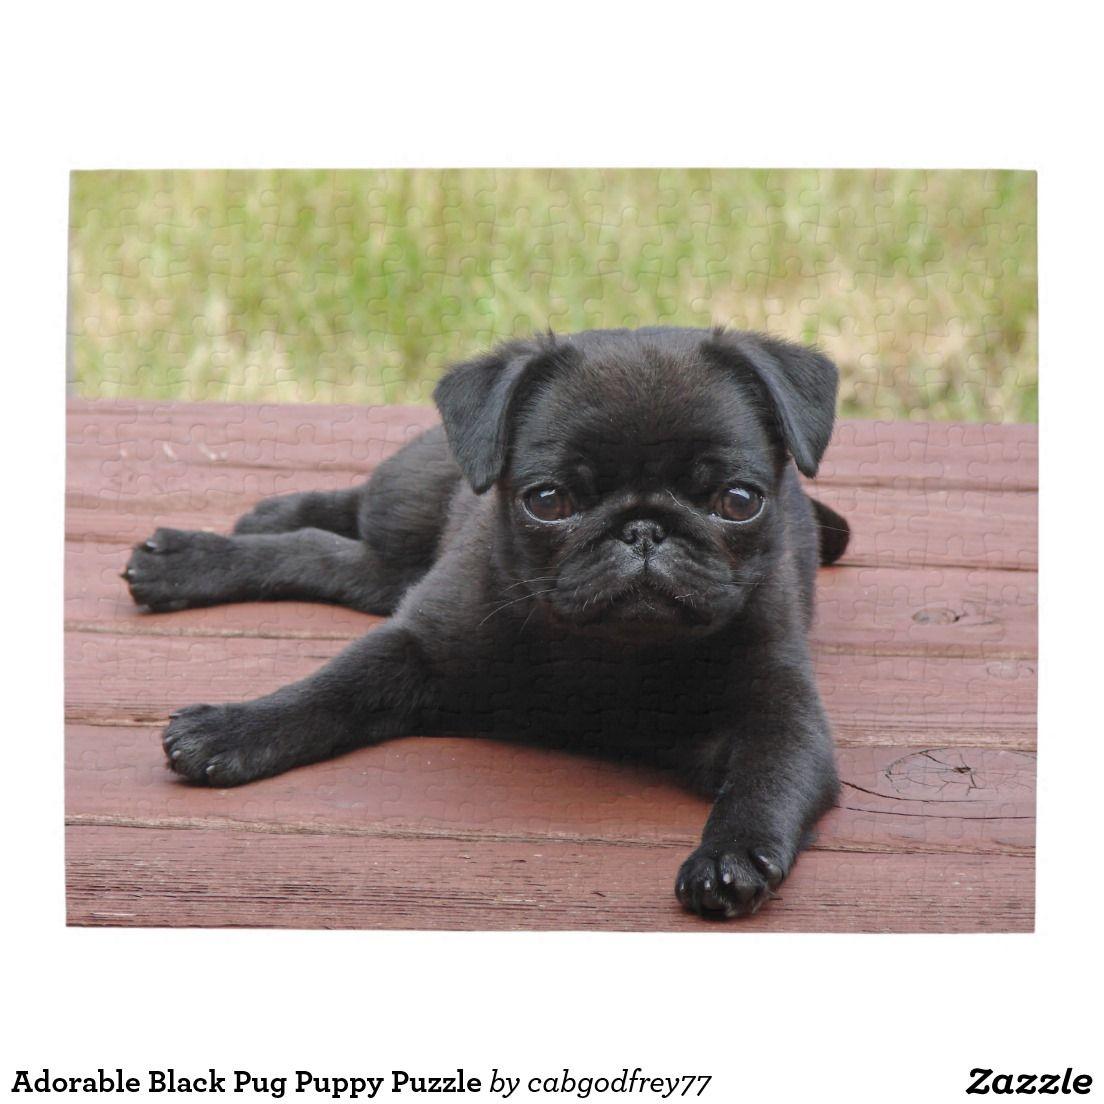 Adorable Black Pug Puppy Puzzle Zazzle Com Cute Pugs Cute Pug